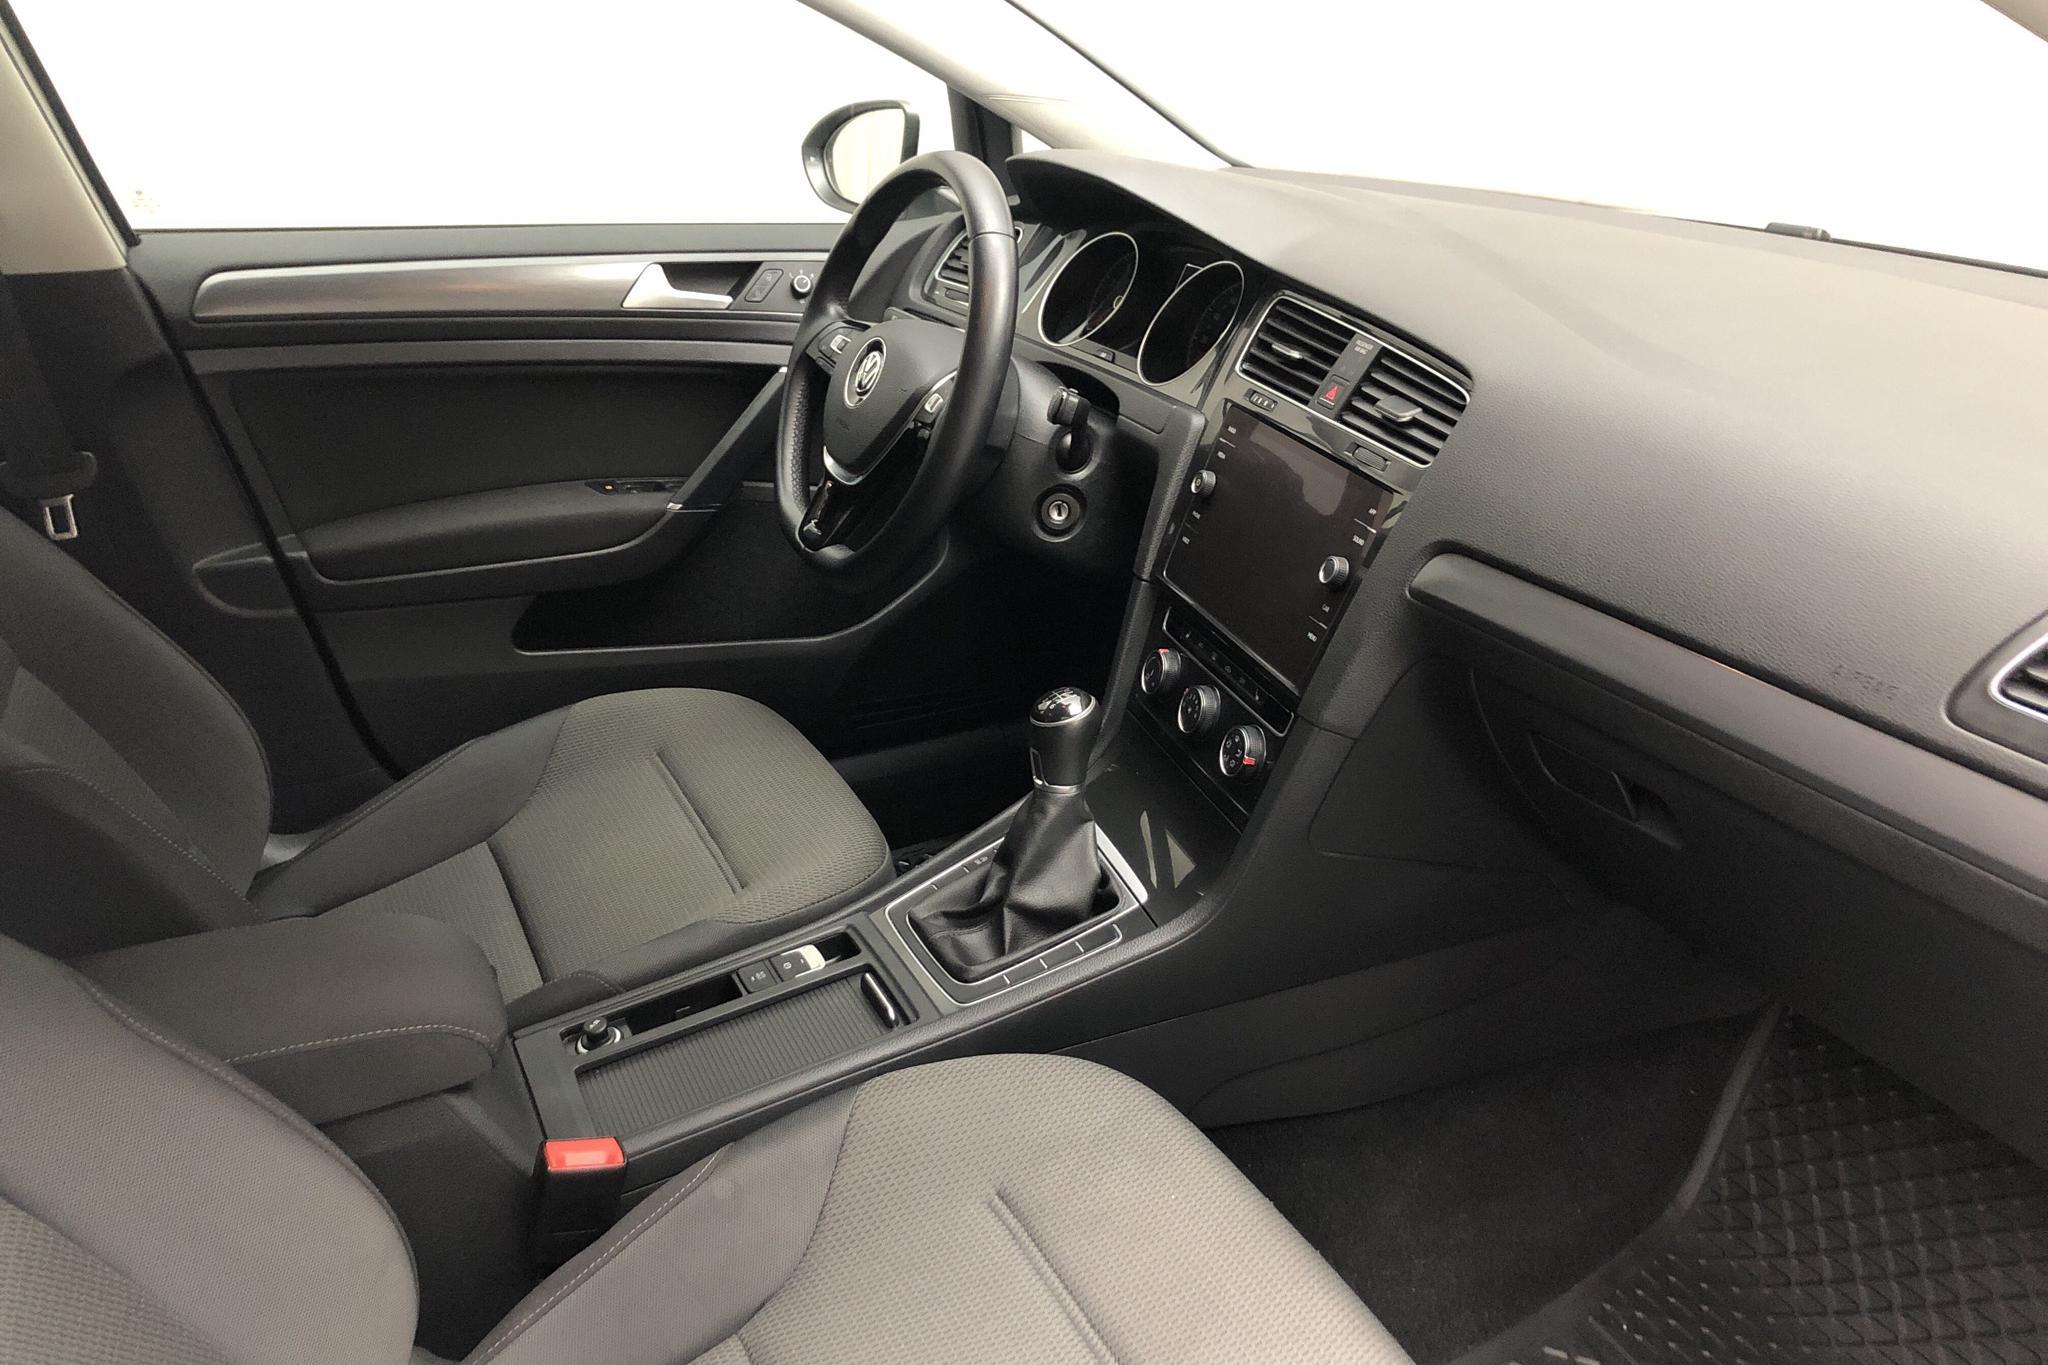 VW Golf VII 1.0 TSI 5dr (110hk) - 6 422 mil - Manuell - vit - 2018